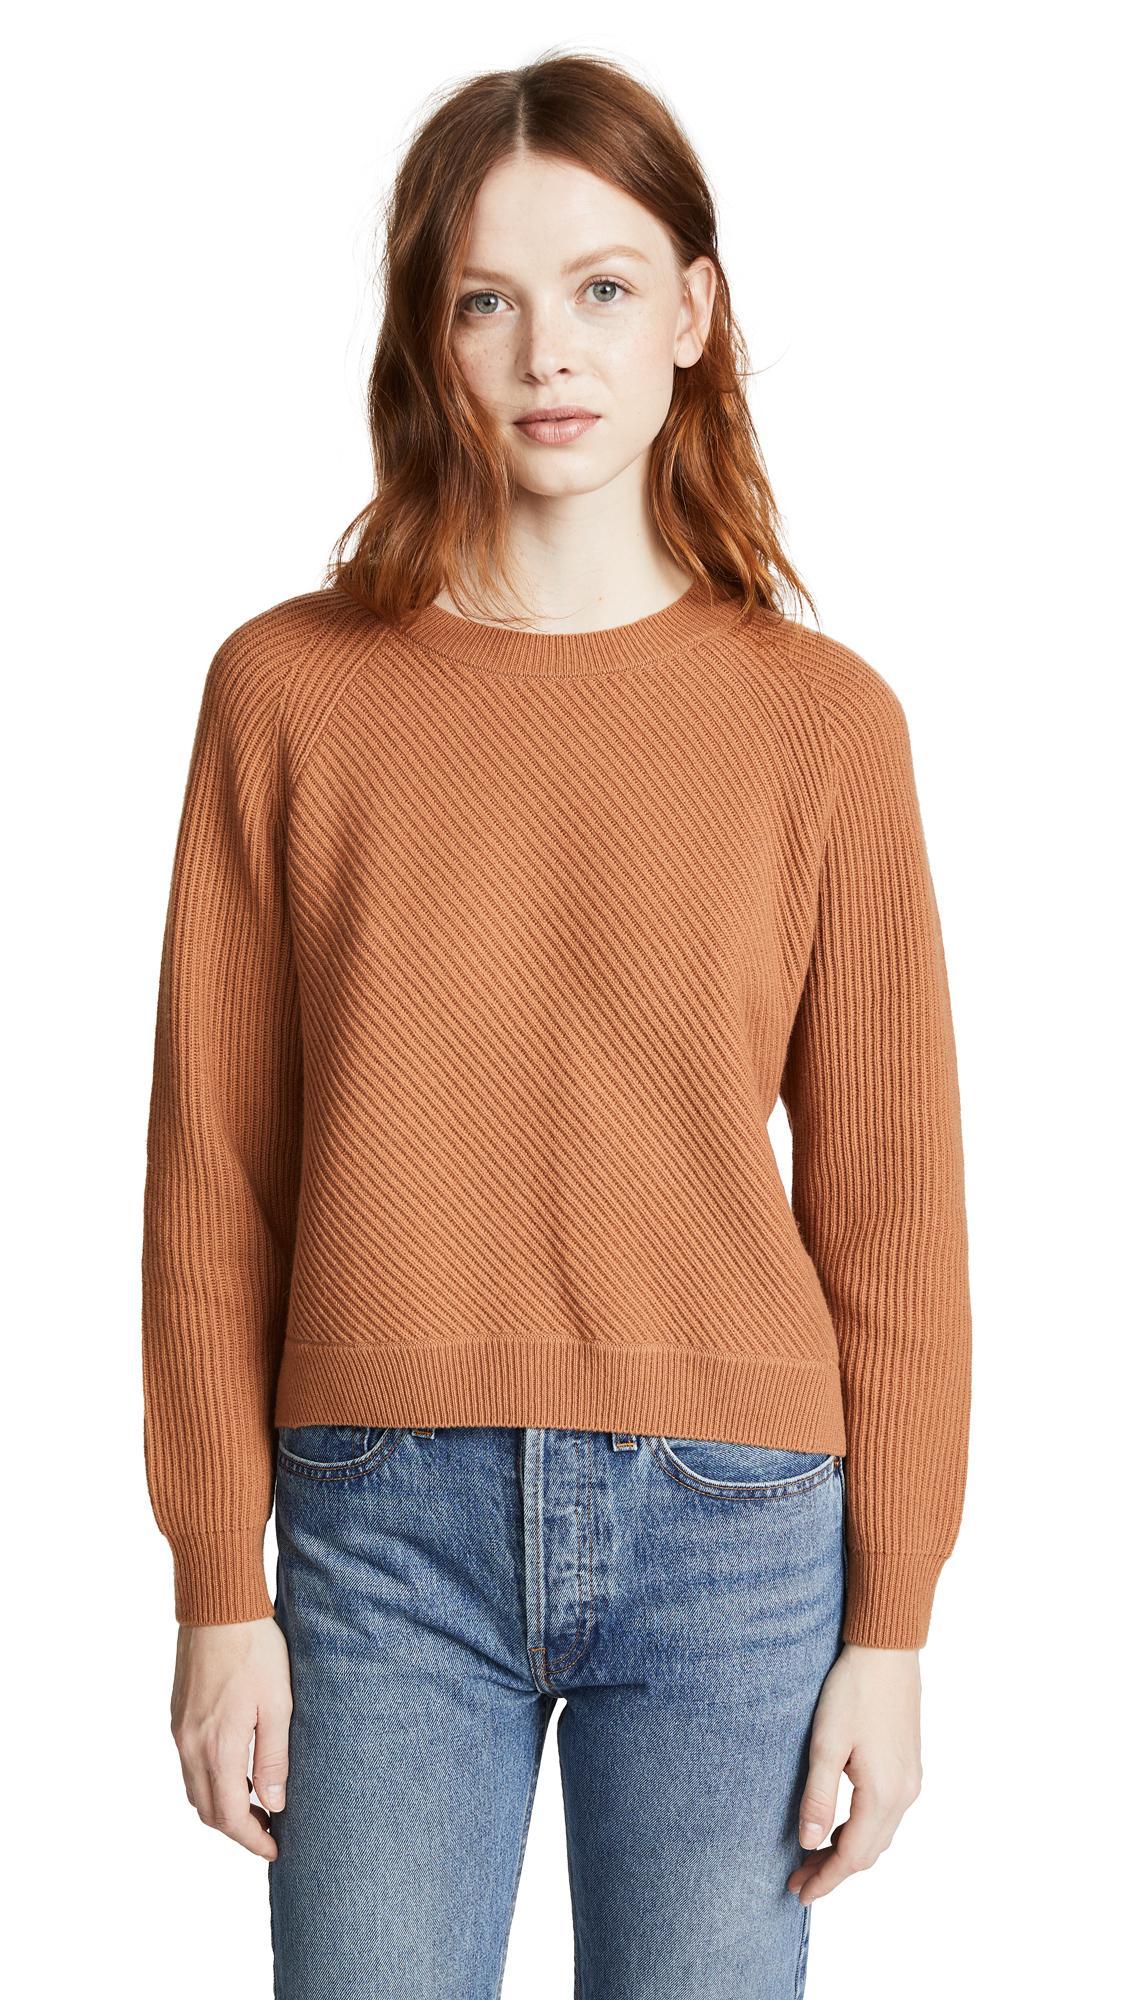 59948c7599a72b Vince Diagonal Rib Wool & Cashmere Sweater In Adobe | ModeSens